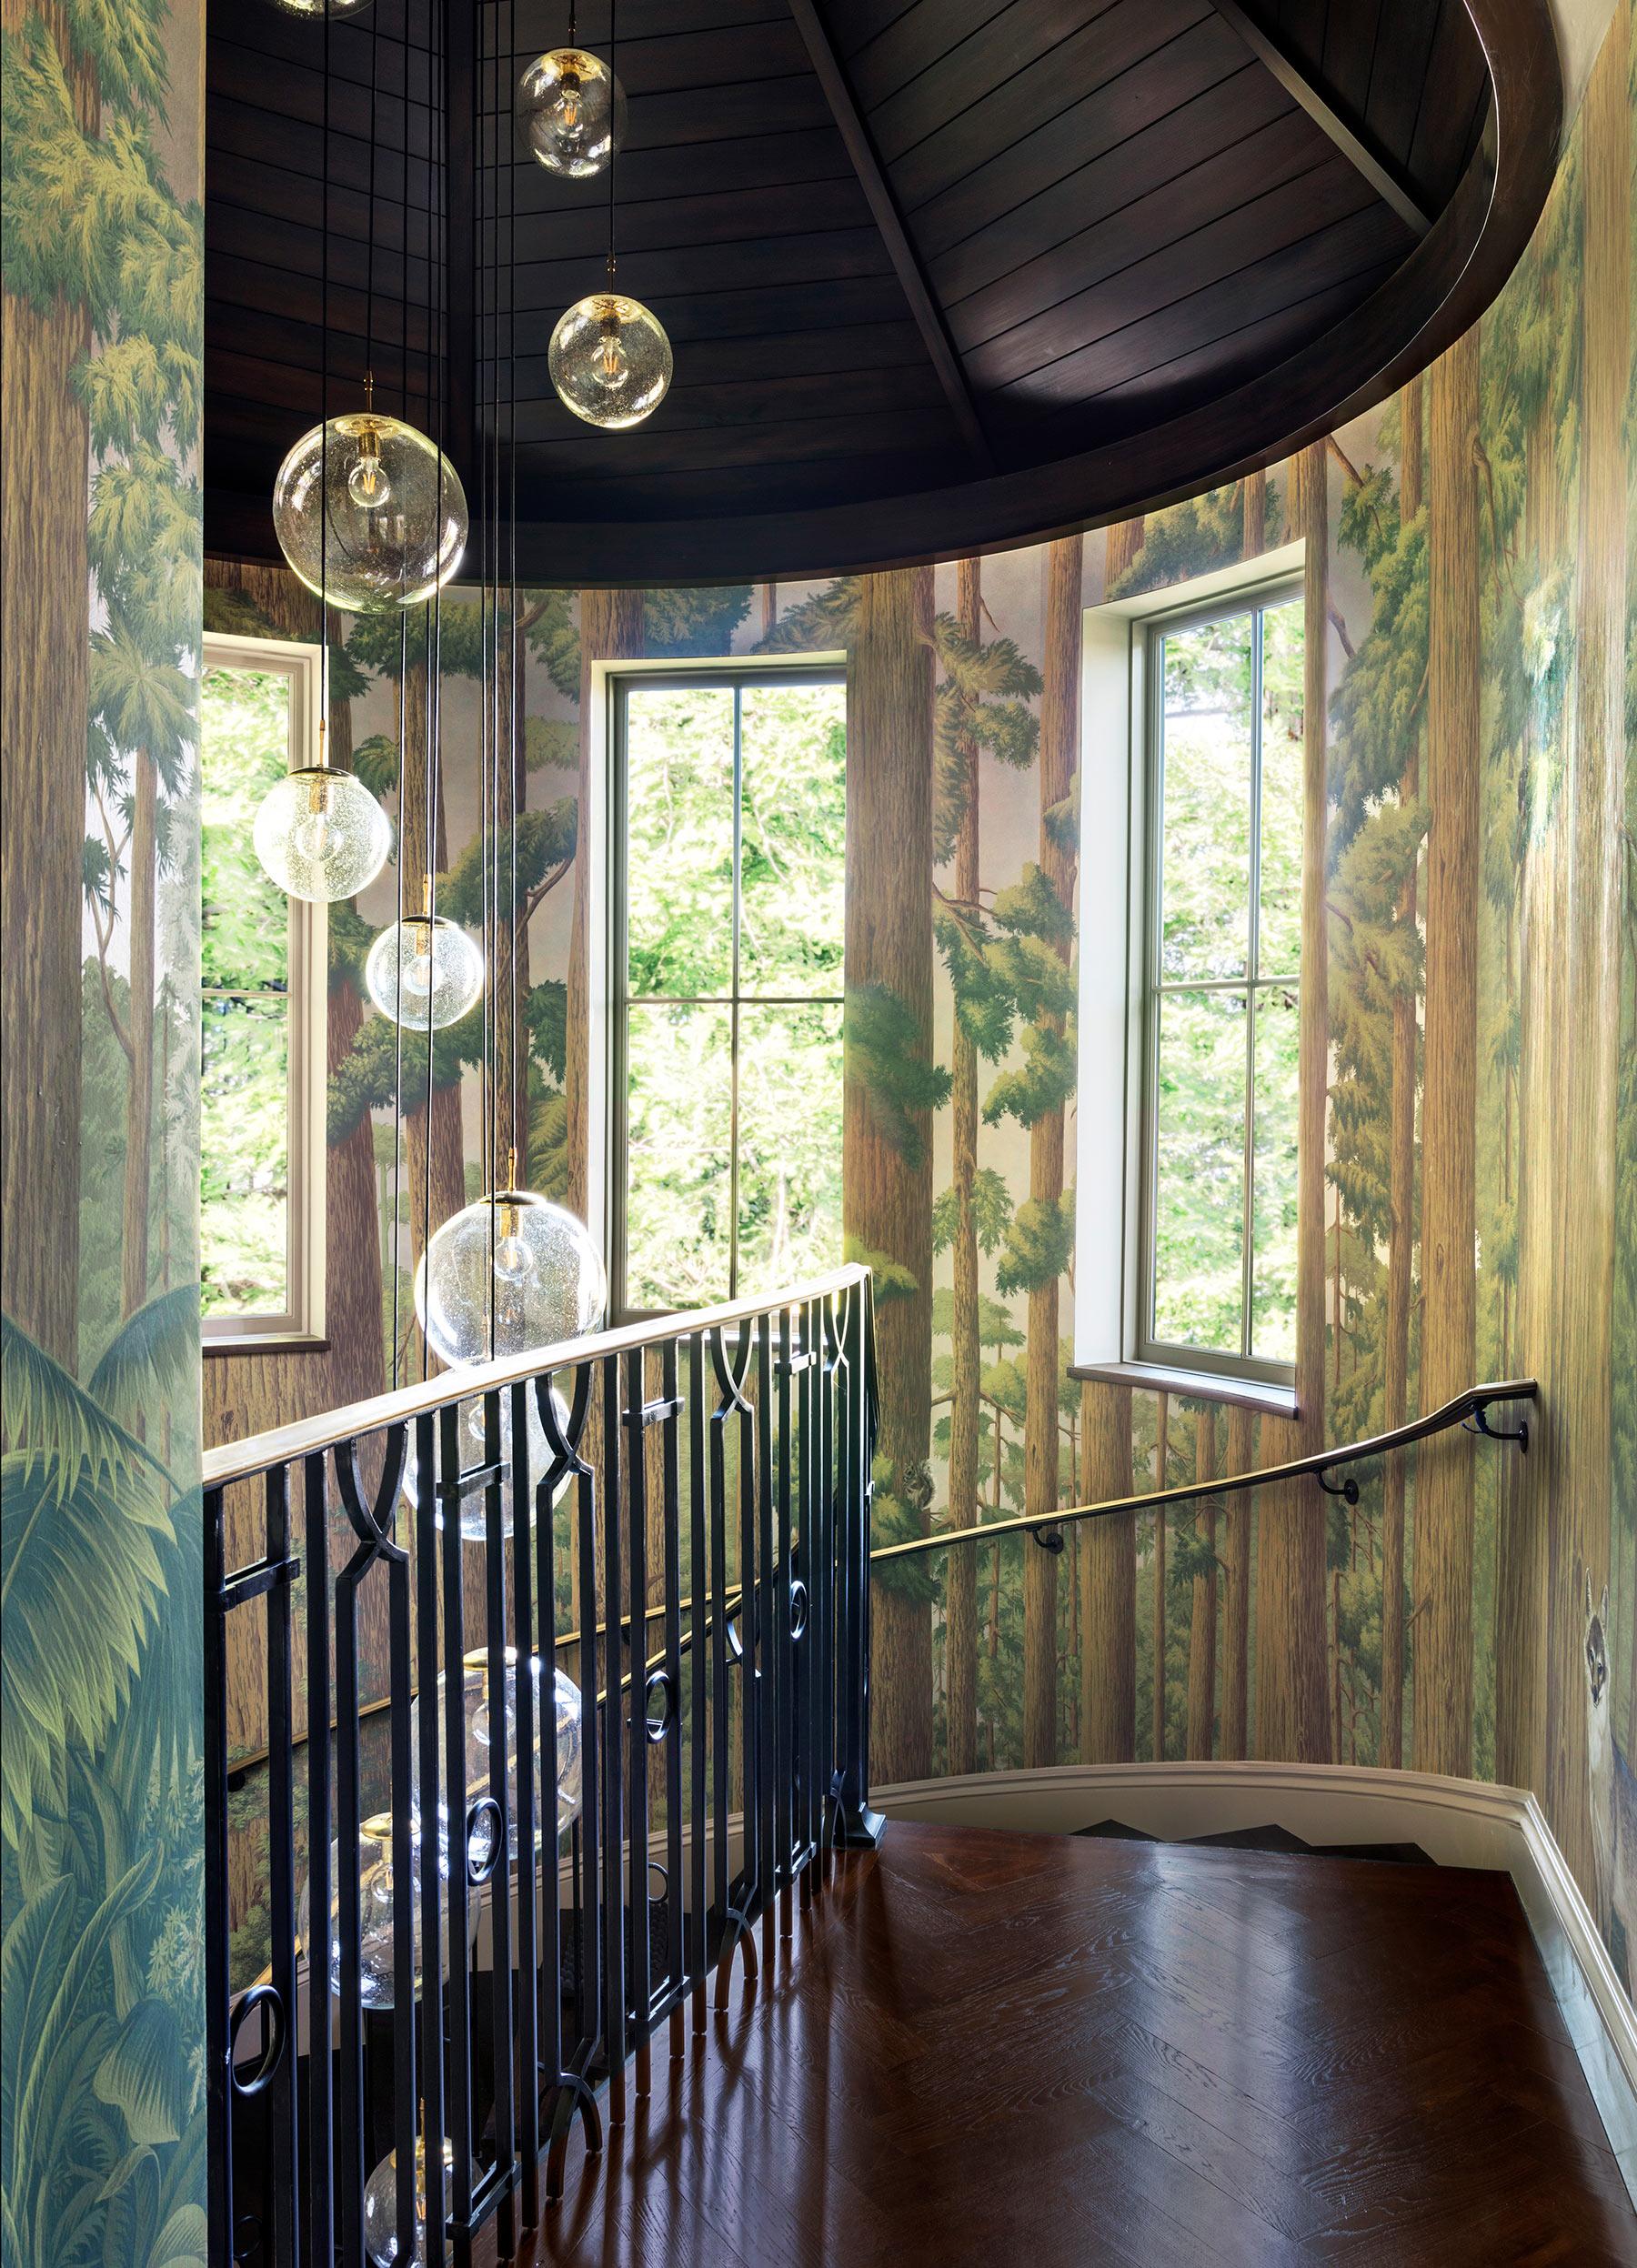 'Redwoods' in Original design colours on Brushed Gold gilded paper